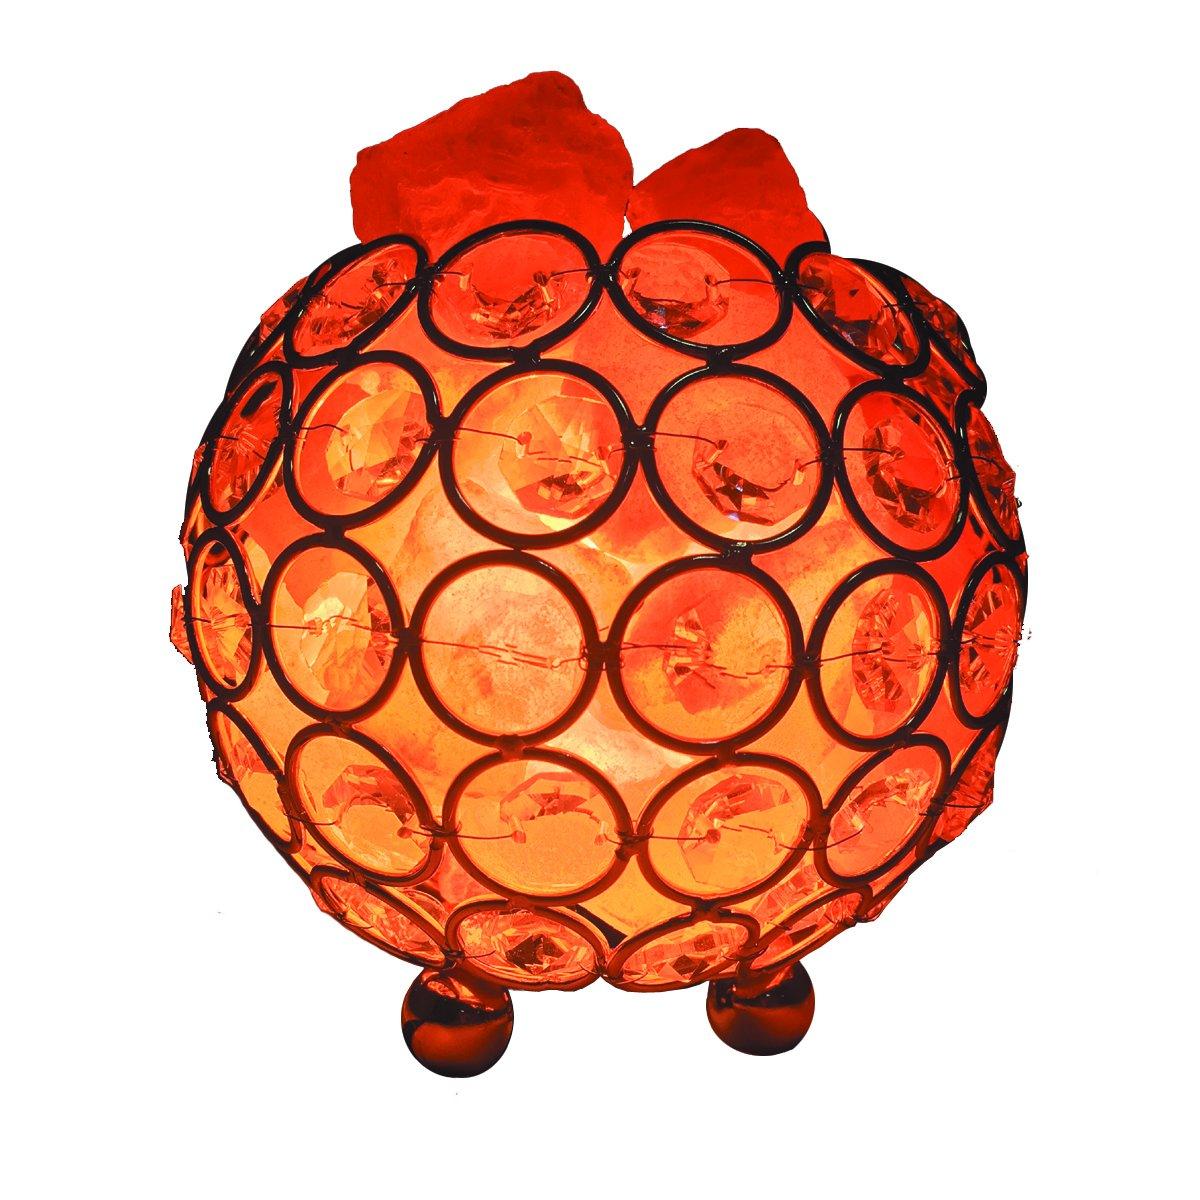 Himalayan Salt Lamp Pink Salt Chunks - Natural Crystal Sea Salt Rock Air Purifier Brightness Dimmable Switch and 2 Bulbs (Golden)